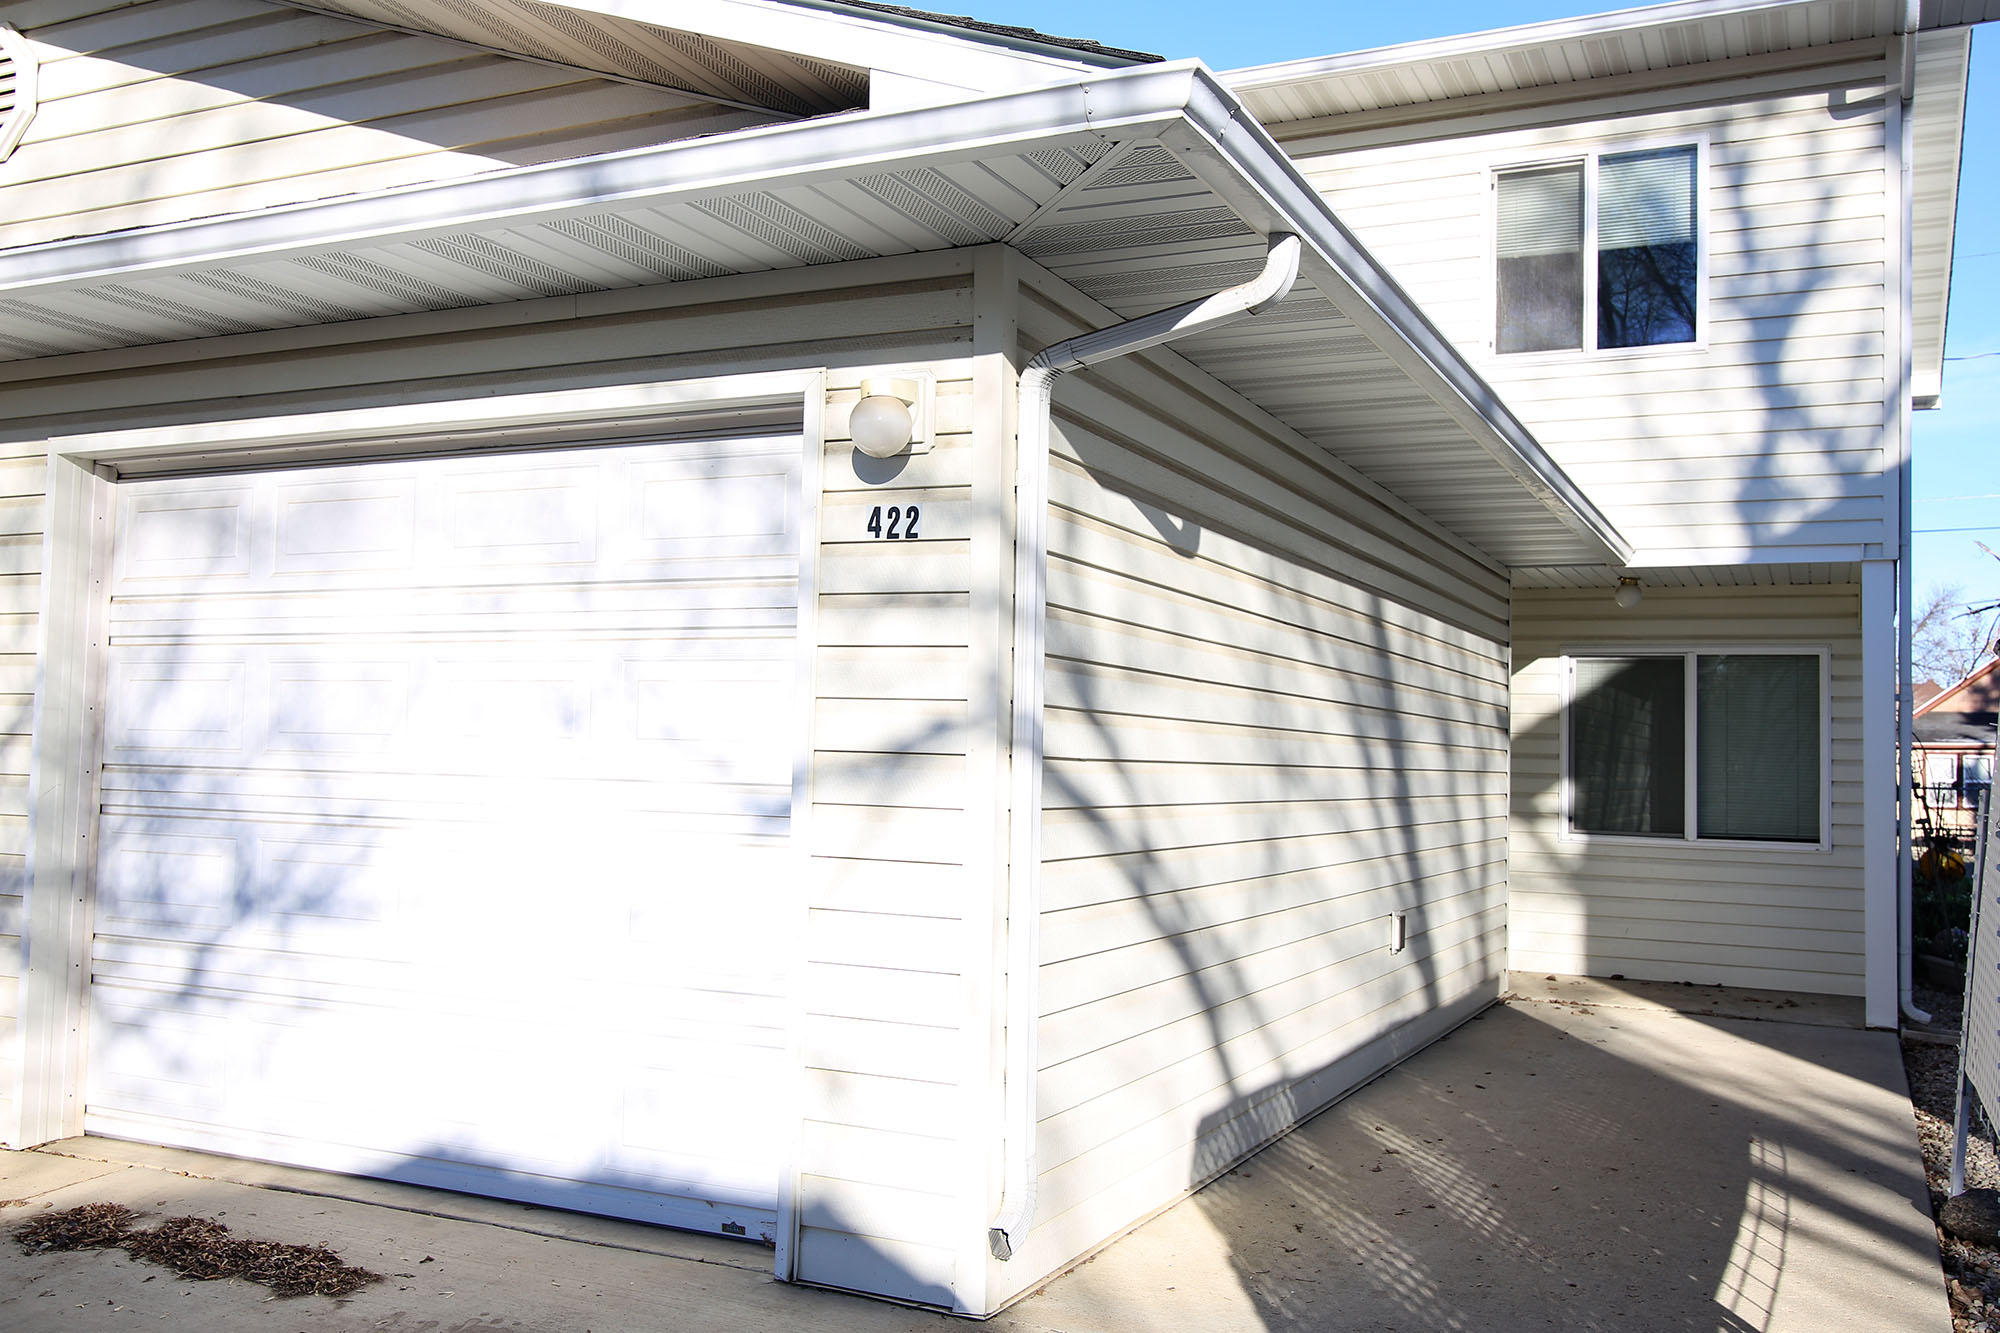 422 Sheridan Avenue, Sheridan, Wyoming 82801, 2 Bedrooms Bedrooms, ,1.5 BathroomsBathrooms,Residential,For Sale,Sheridan,18-1240